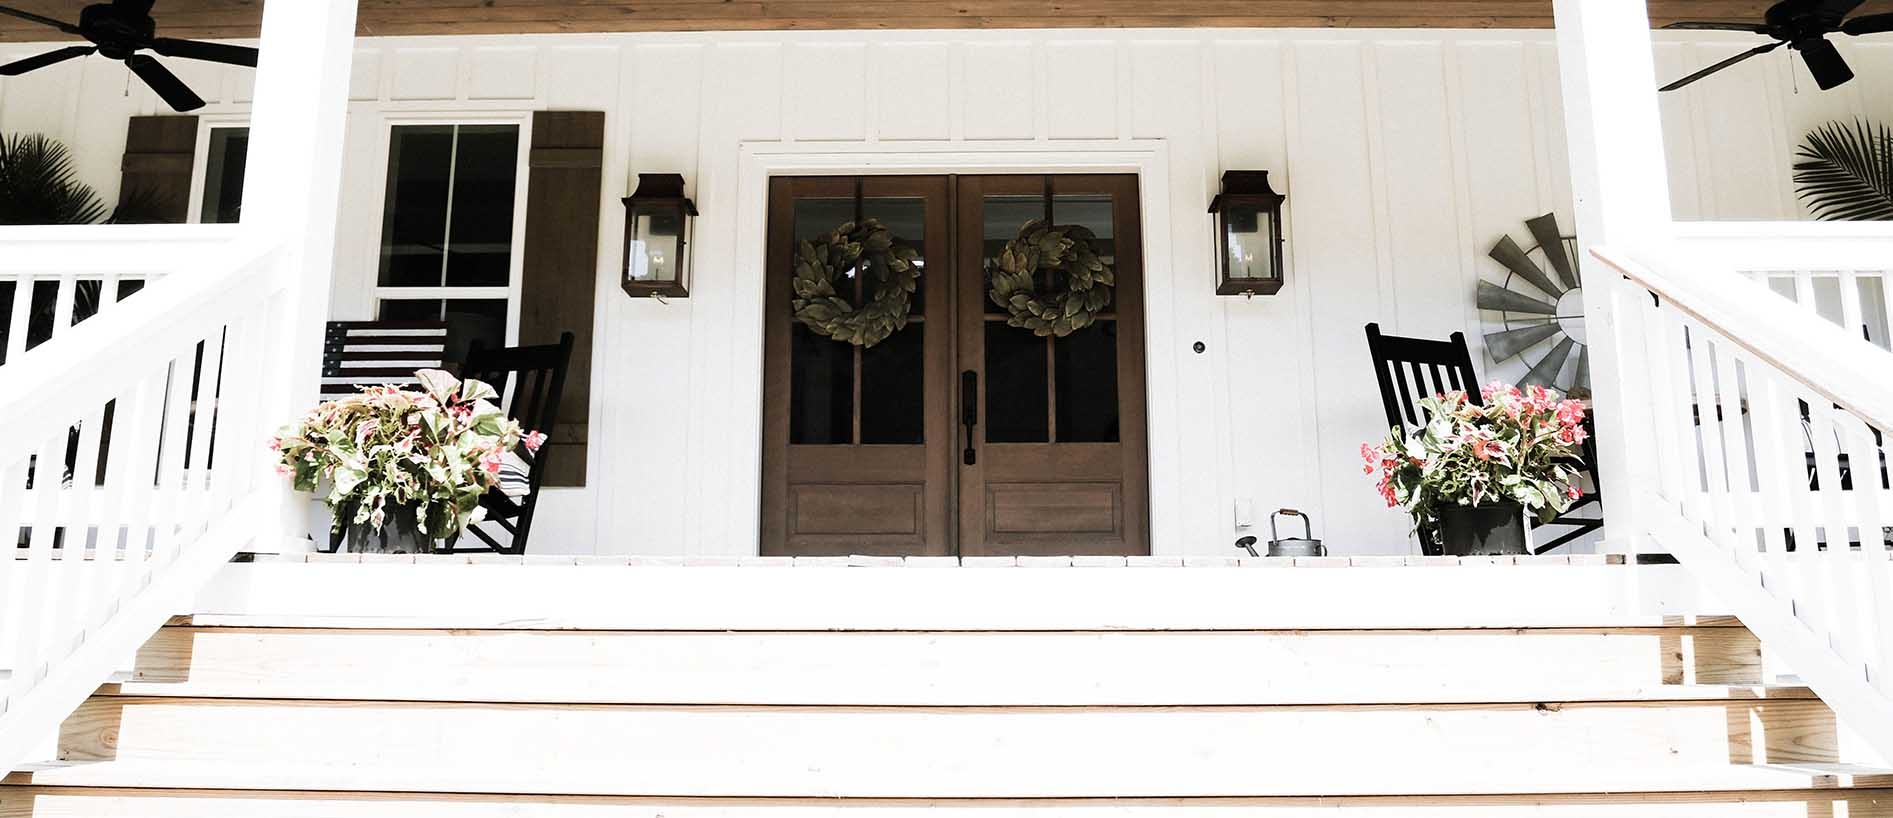 New Construction Homes for Sale in Blue Ridge GA, Ellijay GA, North Georgia